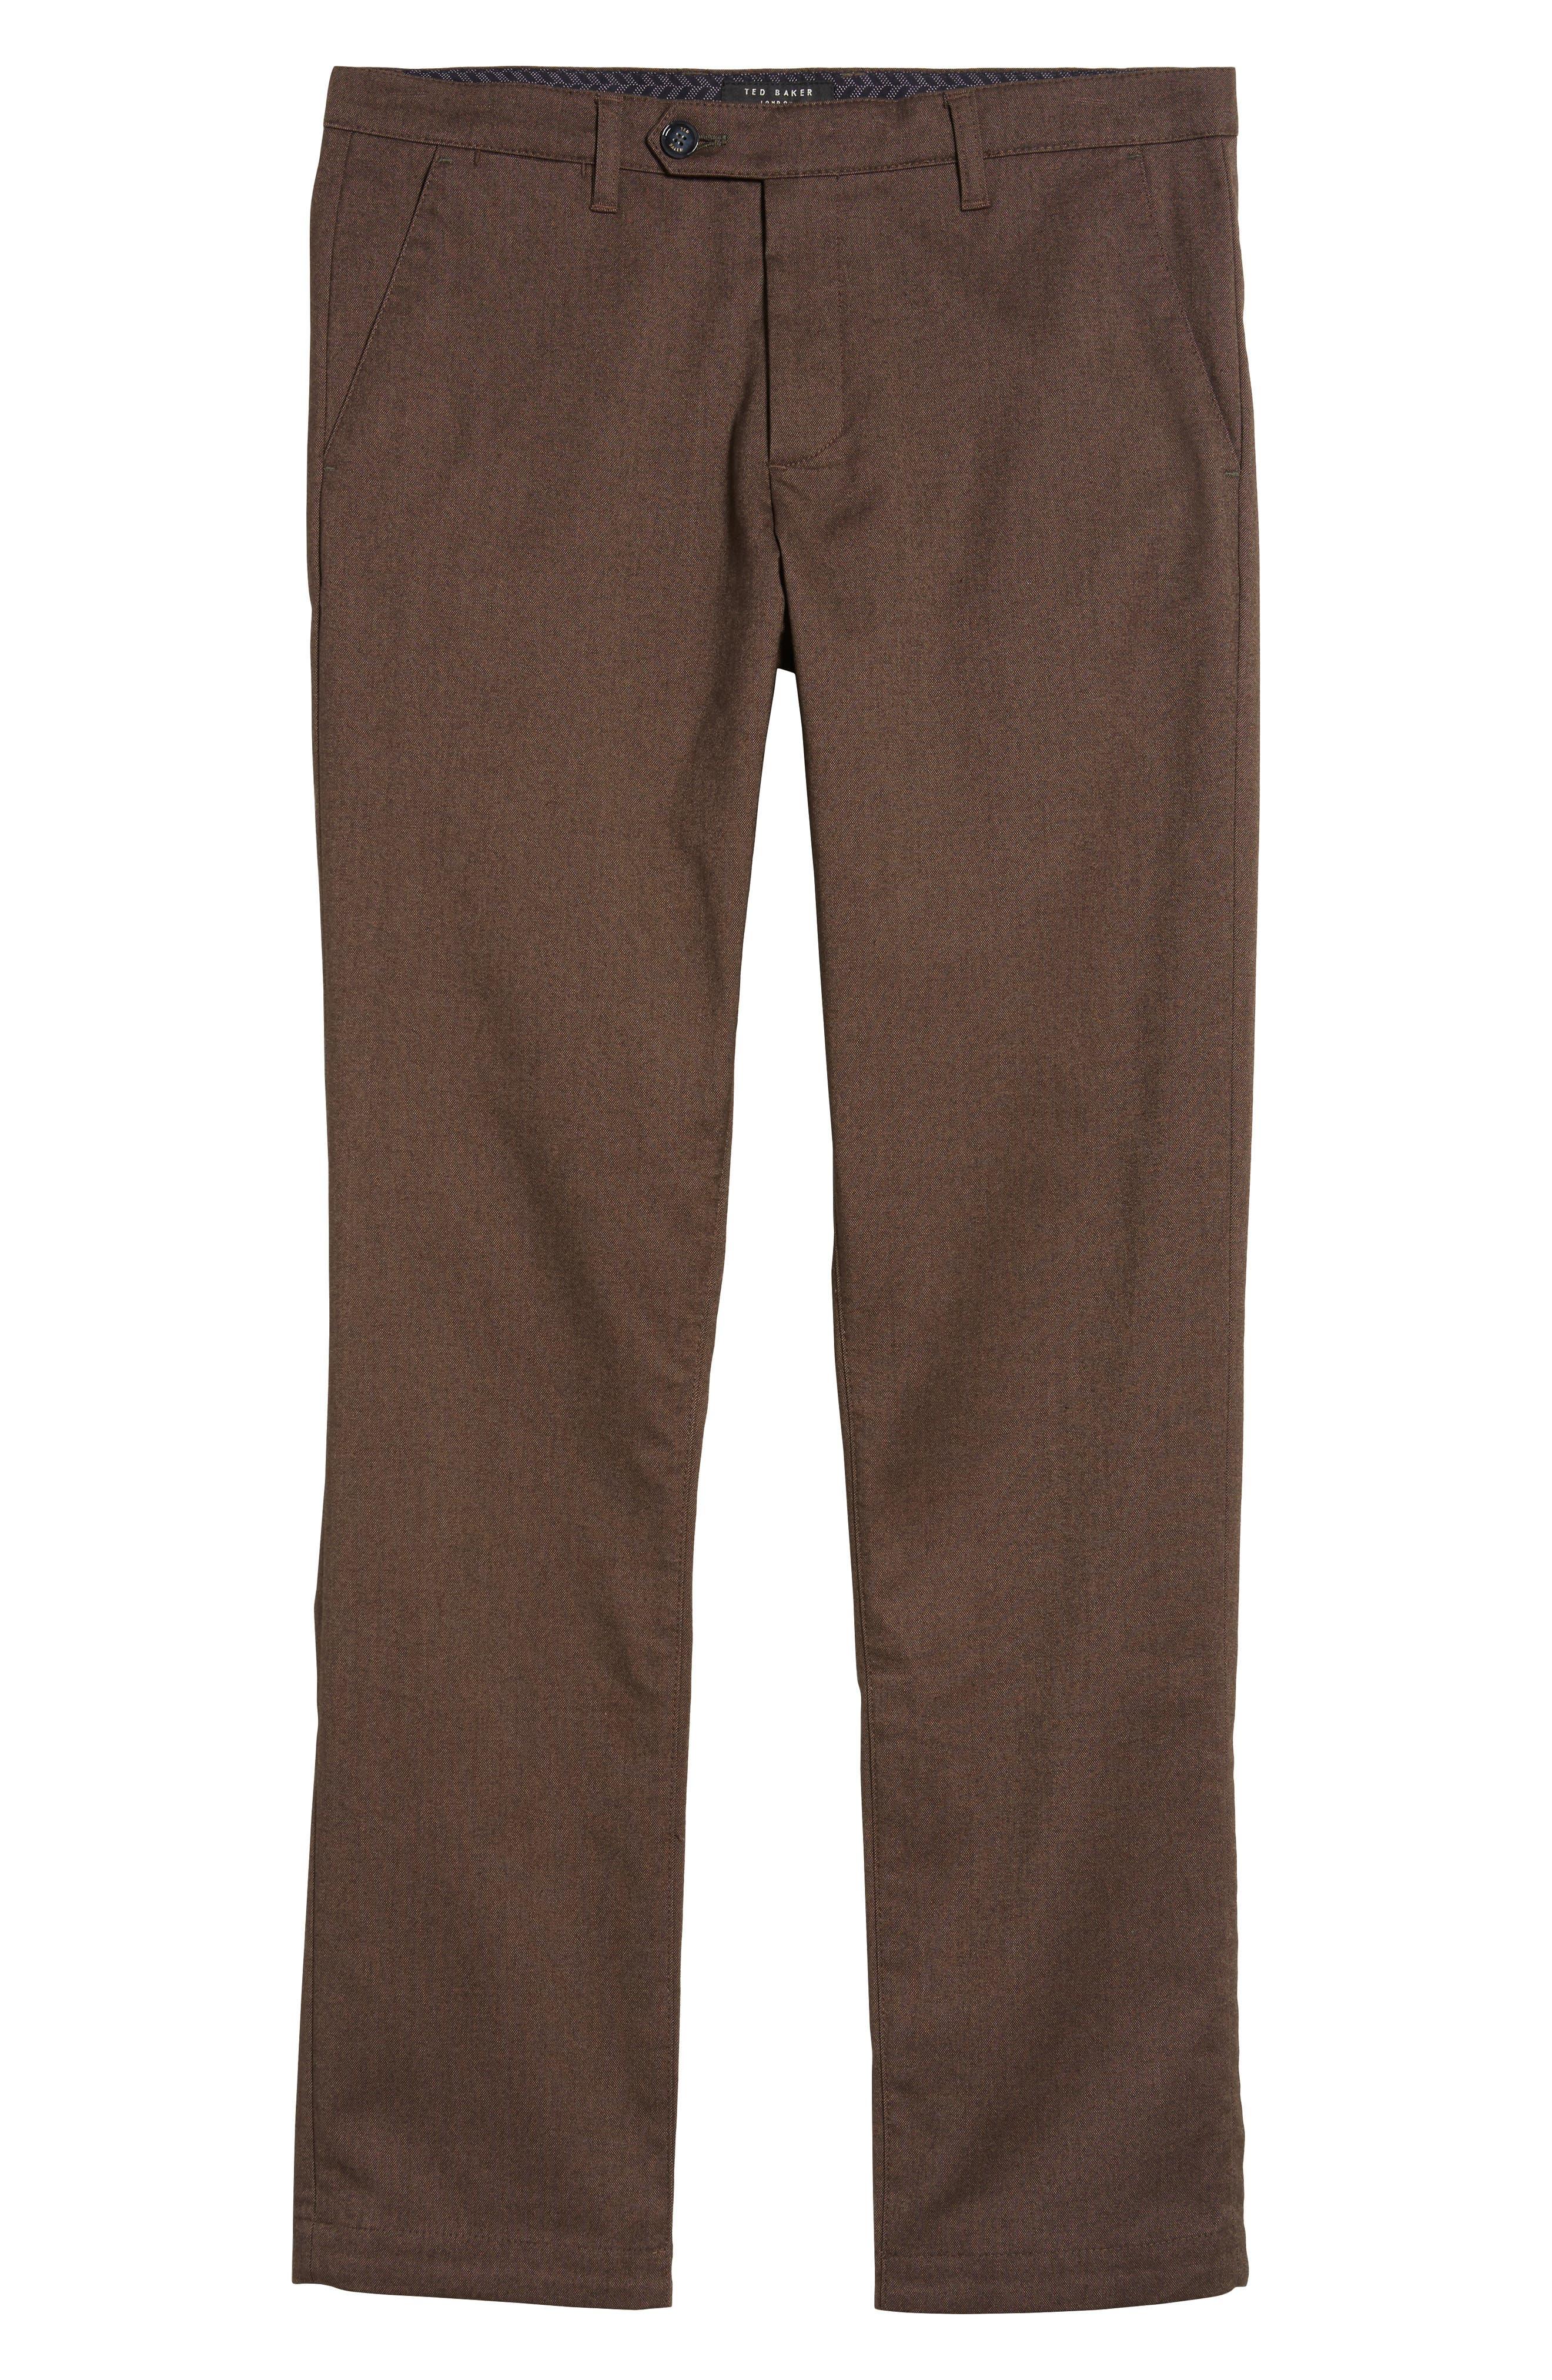 Freshman Modern Fit Brushed Pants,                             Alternate thumbnail 6, color,                             Brown